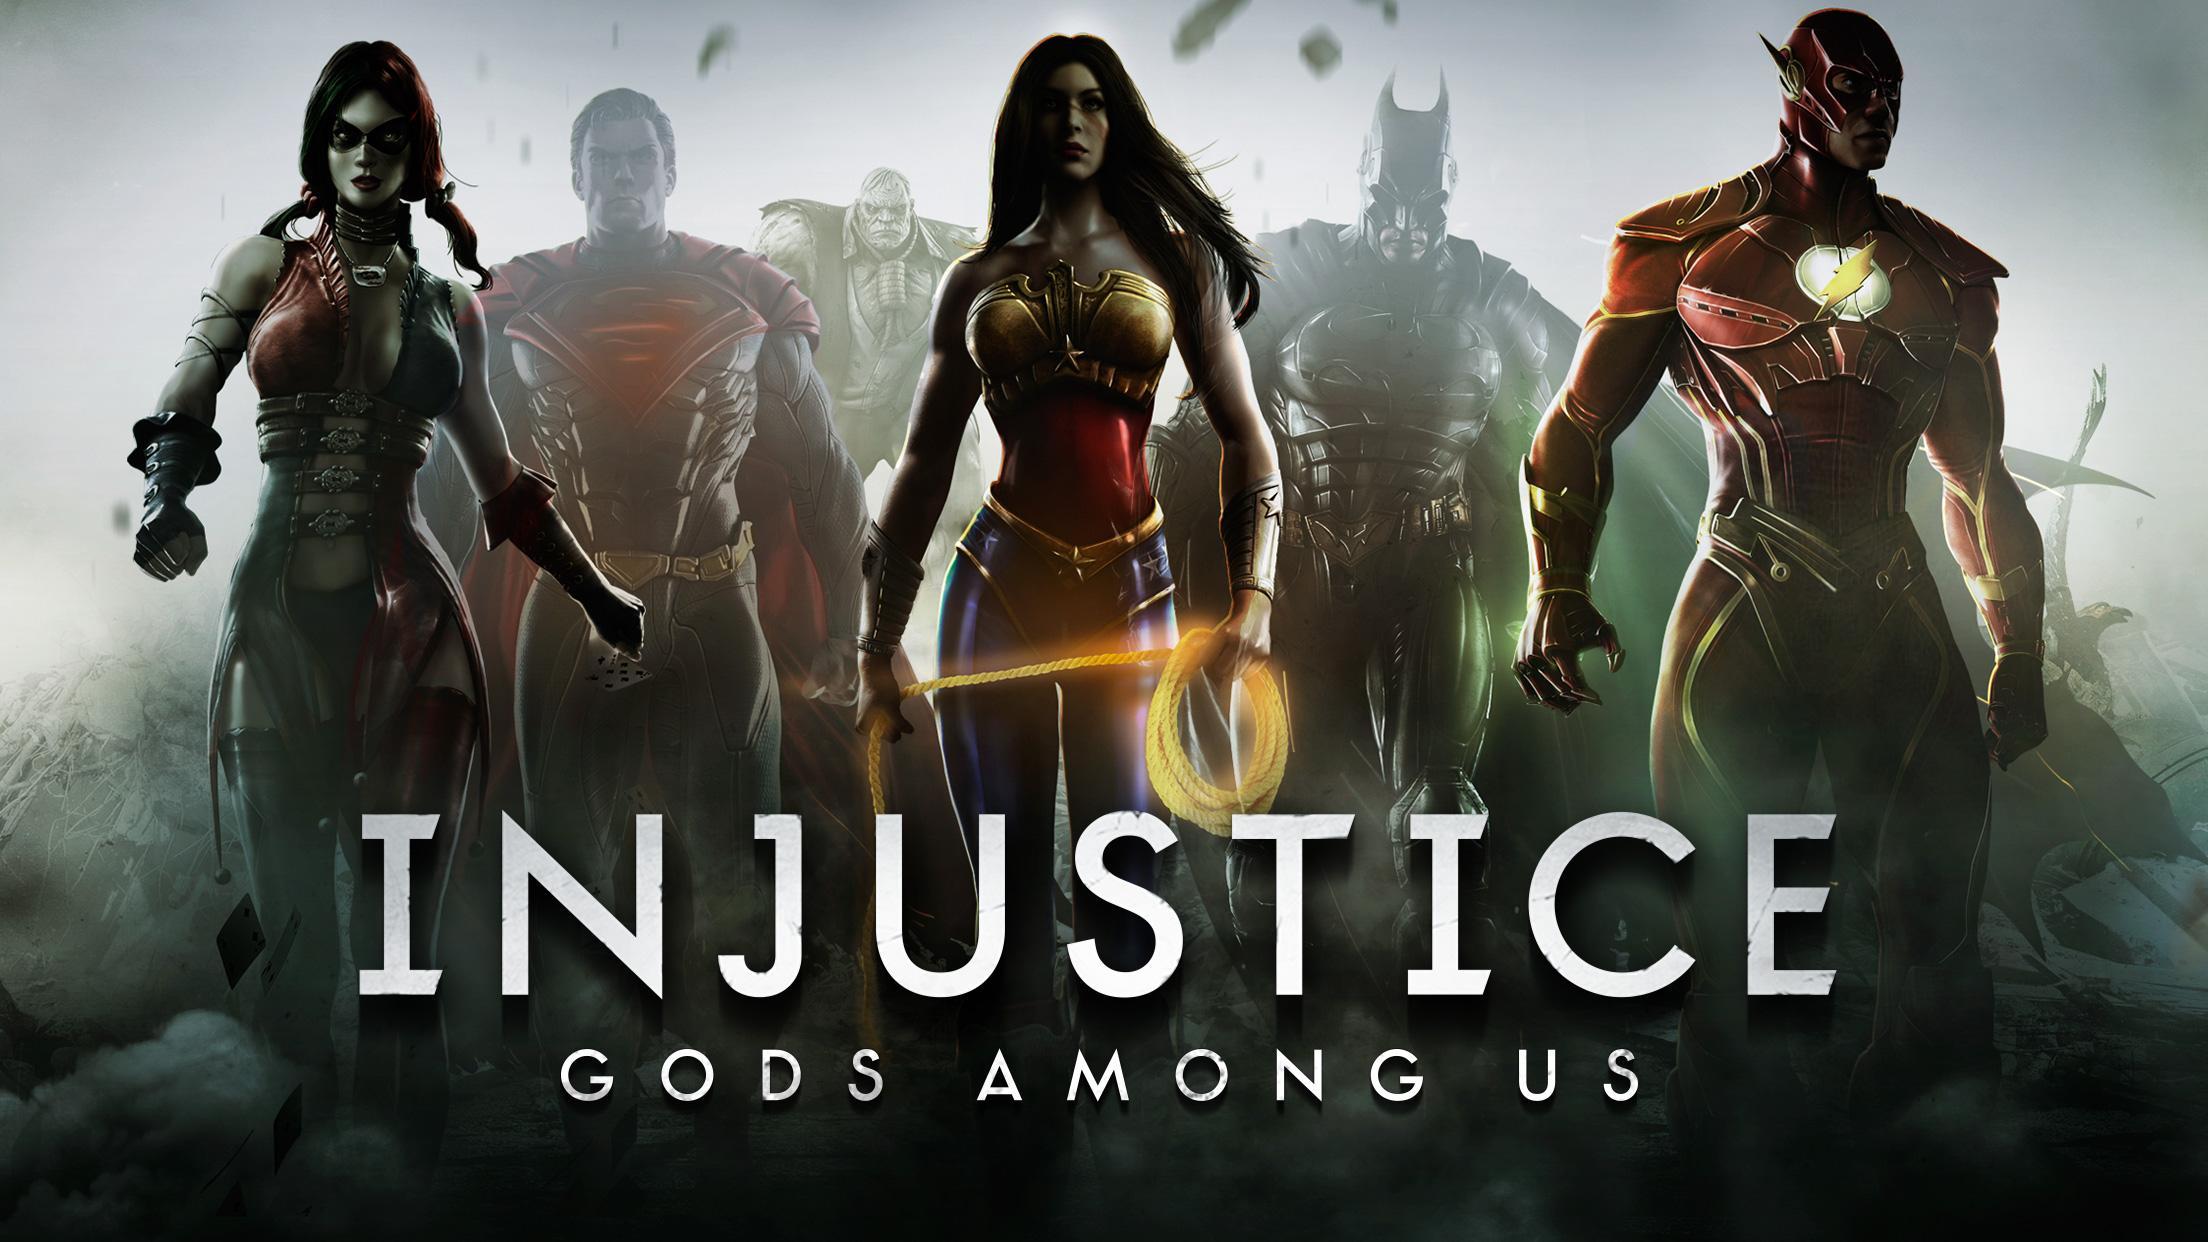 Game Injustice: Gods Among Us V2.21 Mod | Full Money BRAjLkKIUXDp8ezD5hKiDKoalcQ9r6uHY0fVdFD6iFmlIY6pAX2MOTulpL95jQKvas2R=w2626-h1500